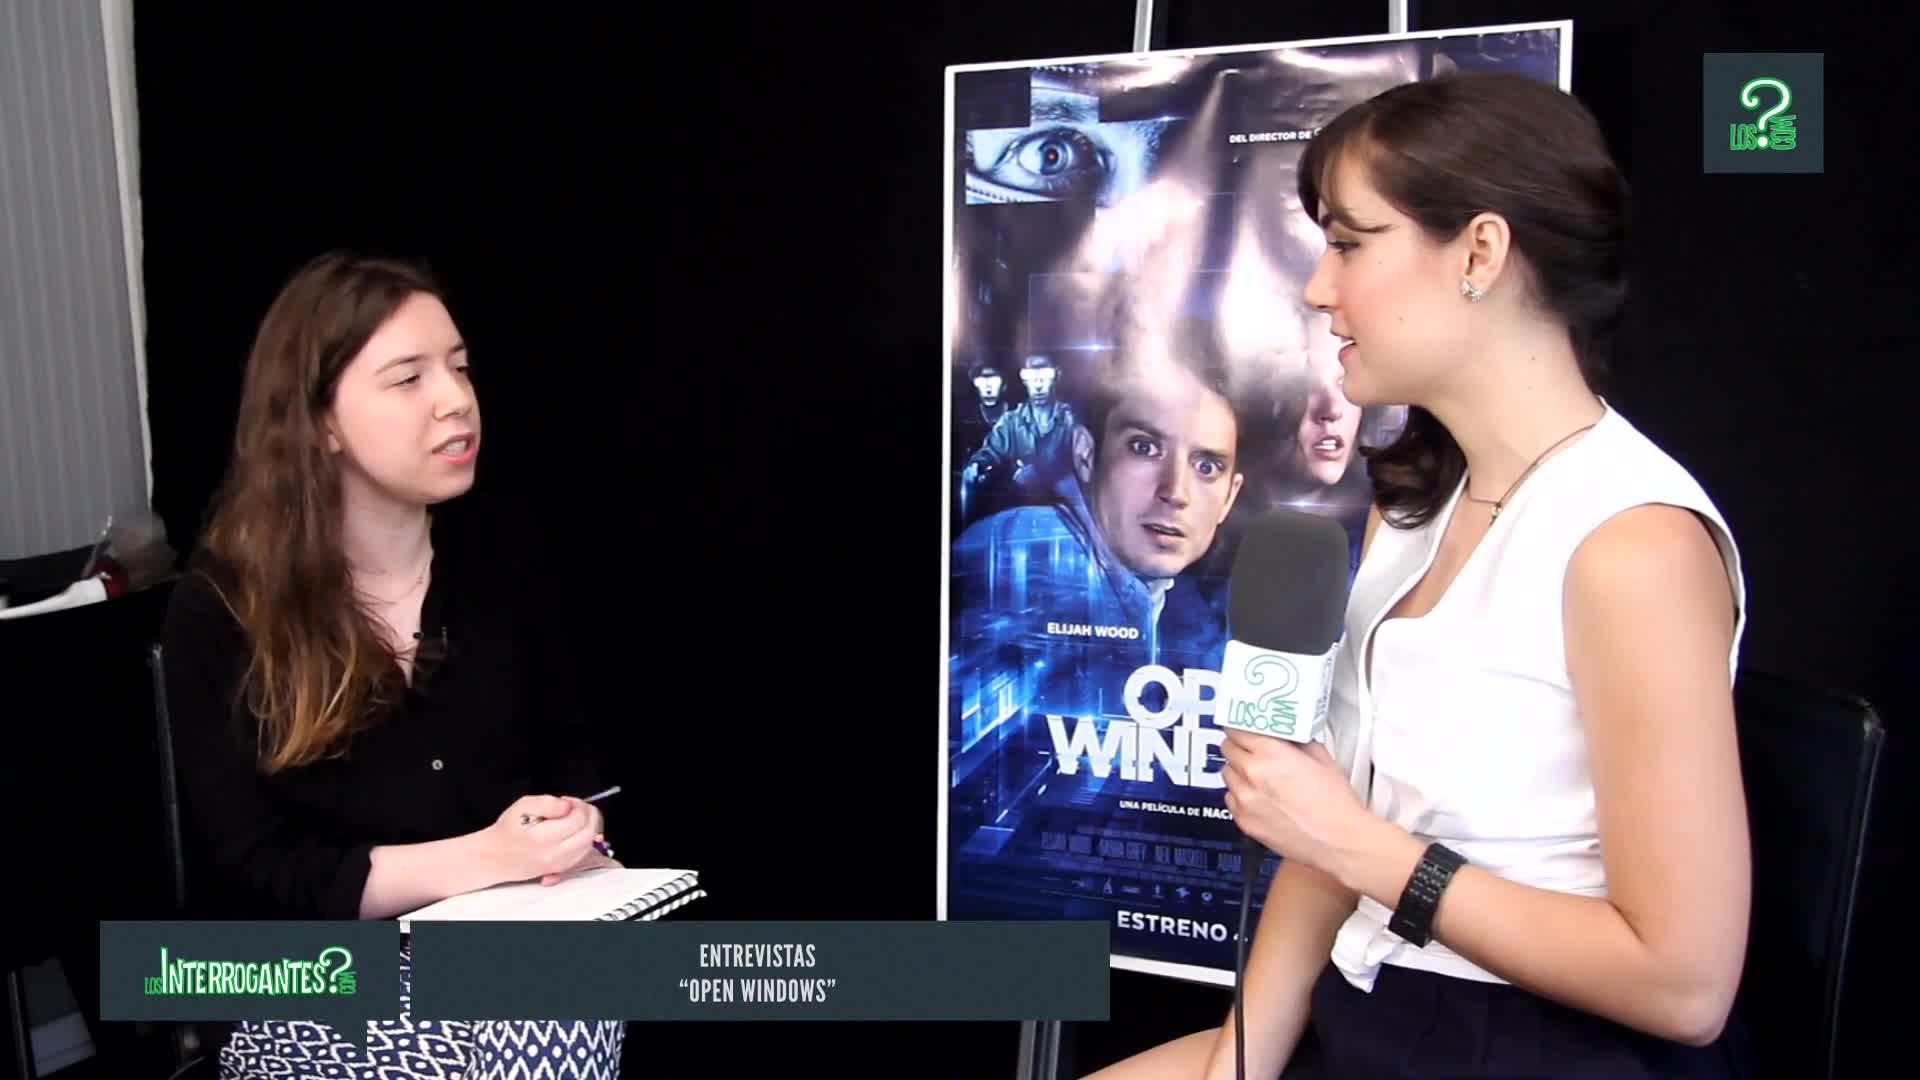 Entrevista, Open Windows, Shasha Grey, elijah wood, sasha grey, 'Open Windows', Sasha Grey interview GIFs